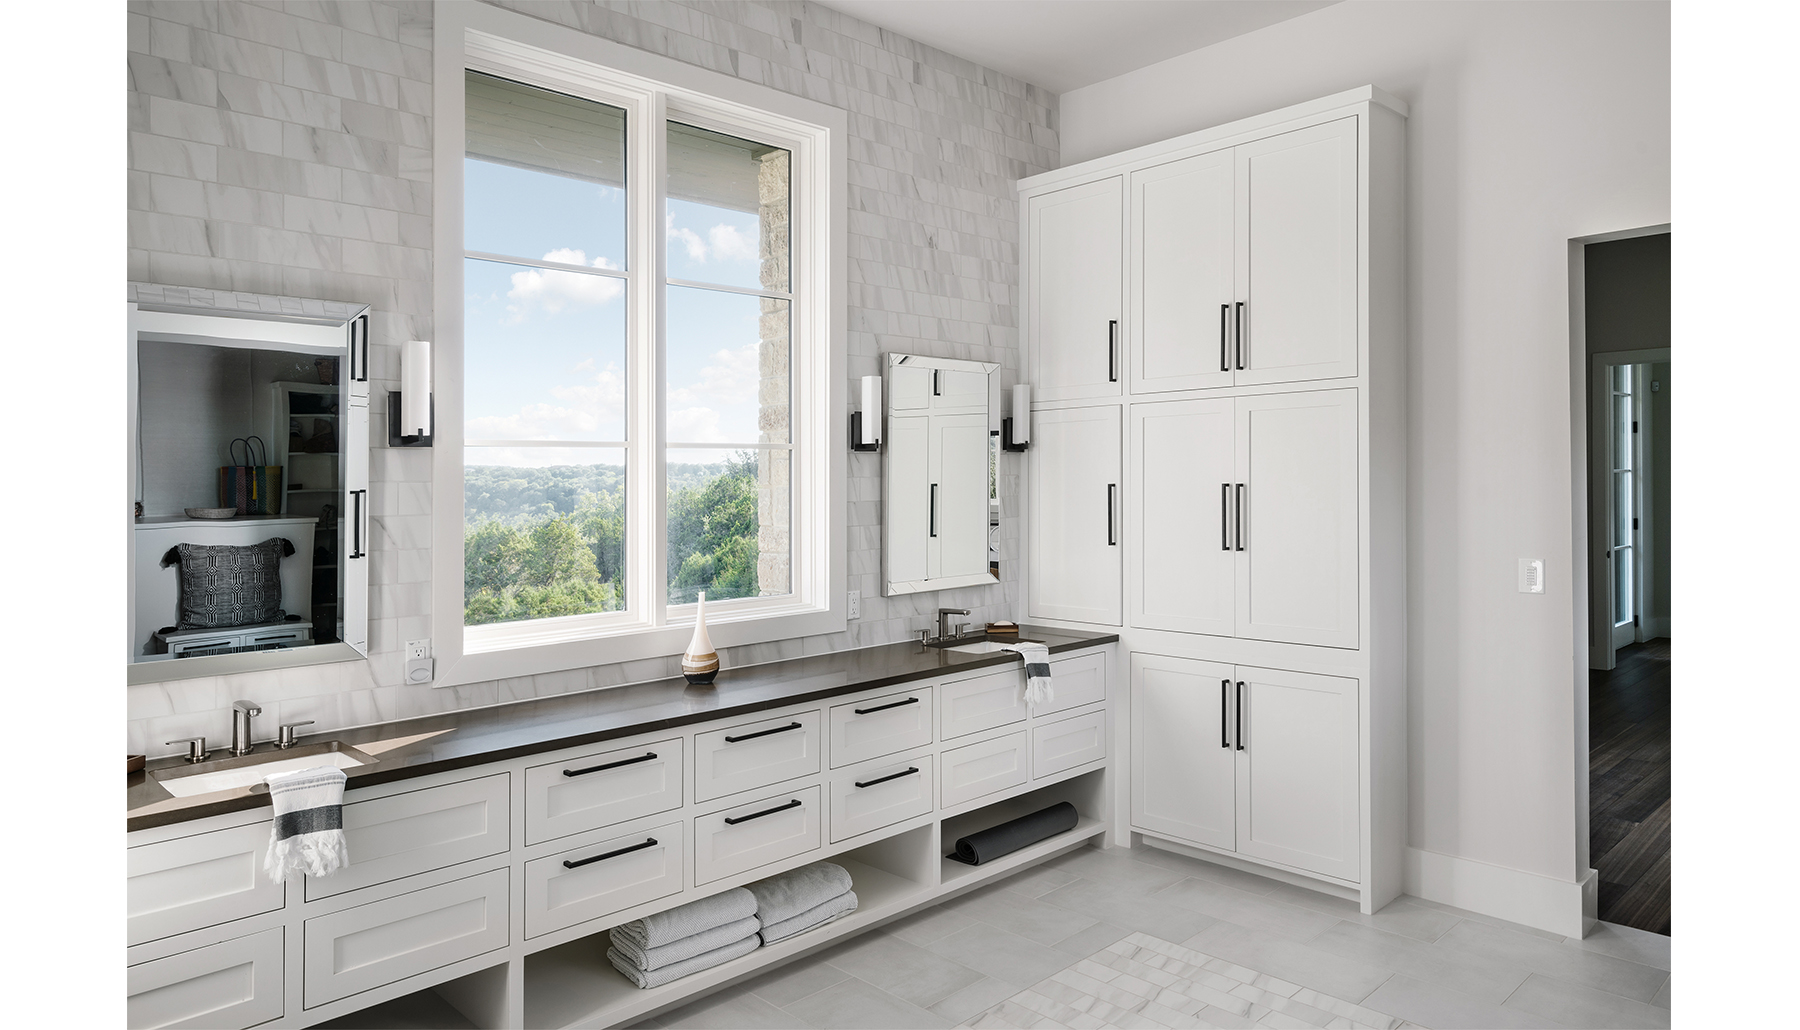 Spicewood Master Bathroom